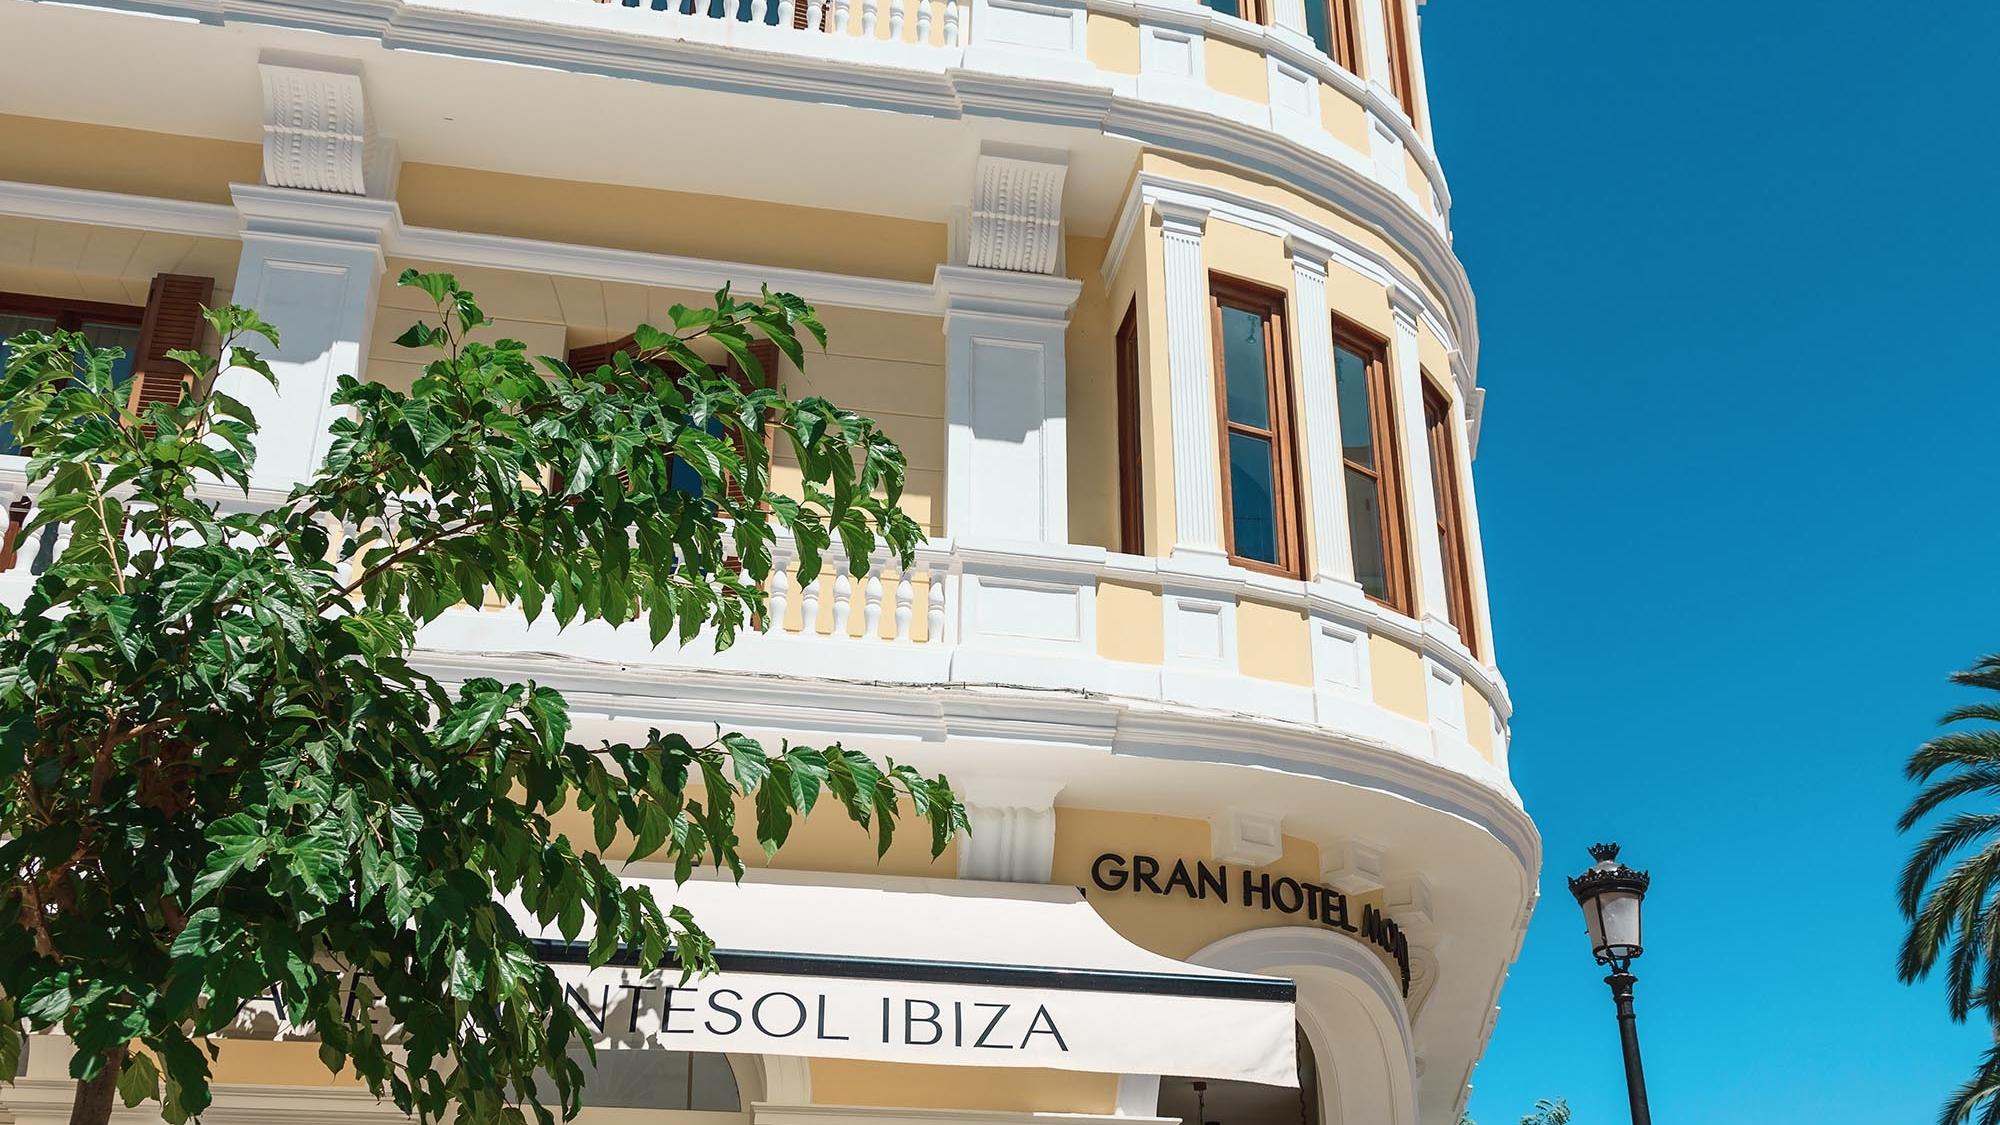 Montesol Ibiza